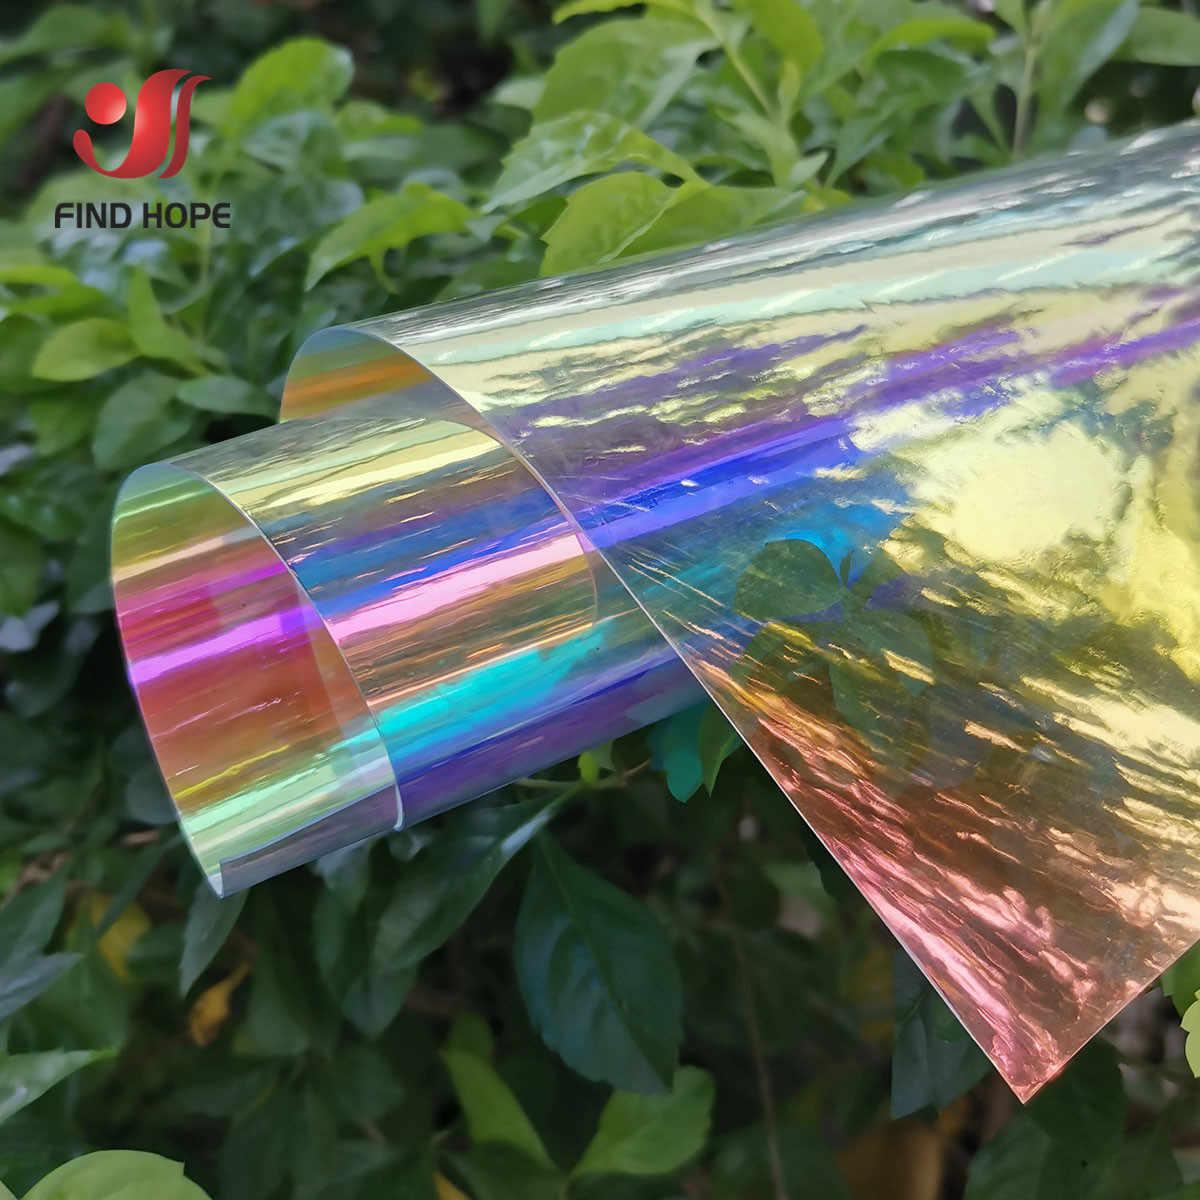 Láser iridiscente holográfico película transparente PVC tela láser Arco Iris brillante Material de vinilo arco bolsa artesanal